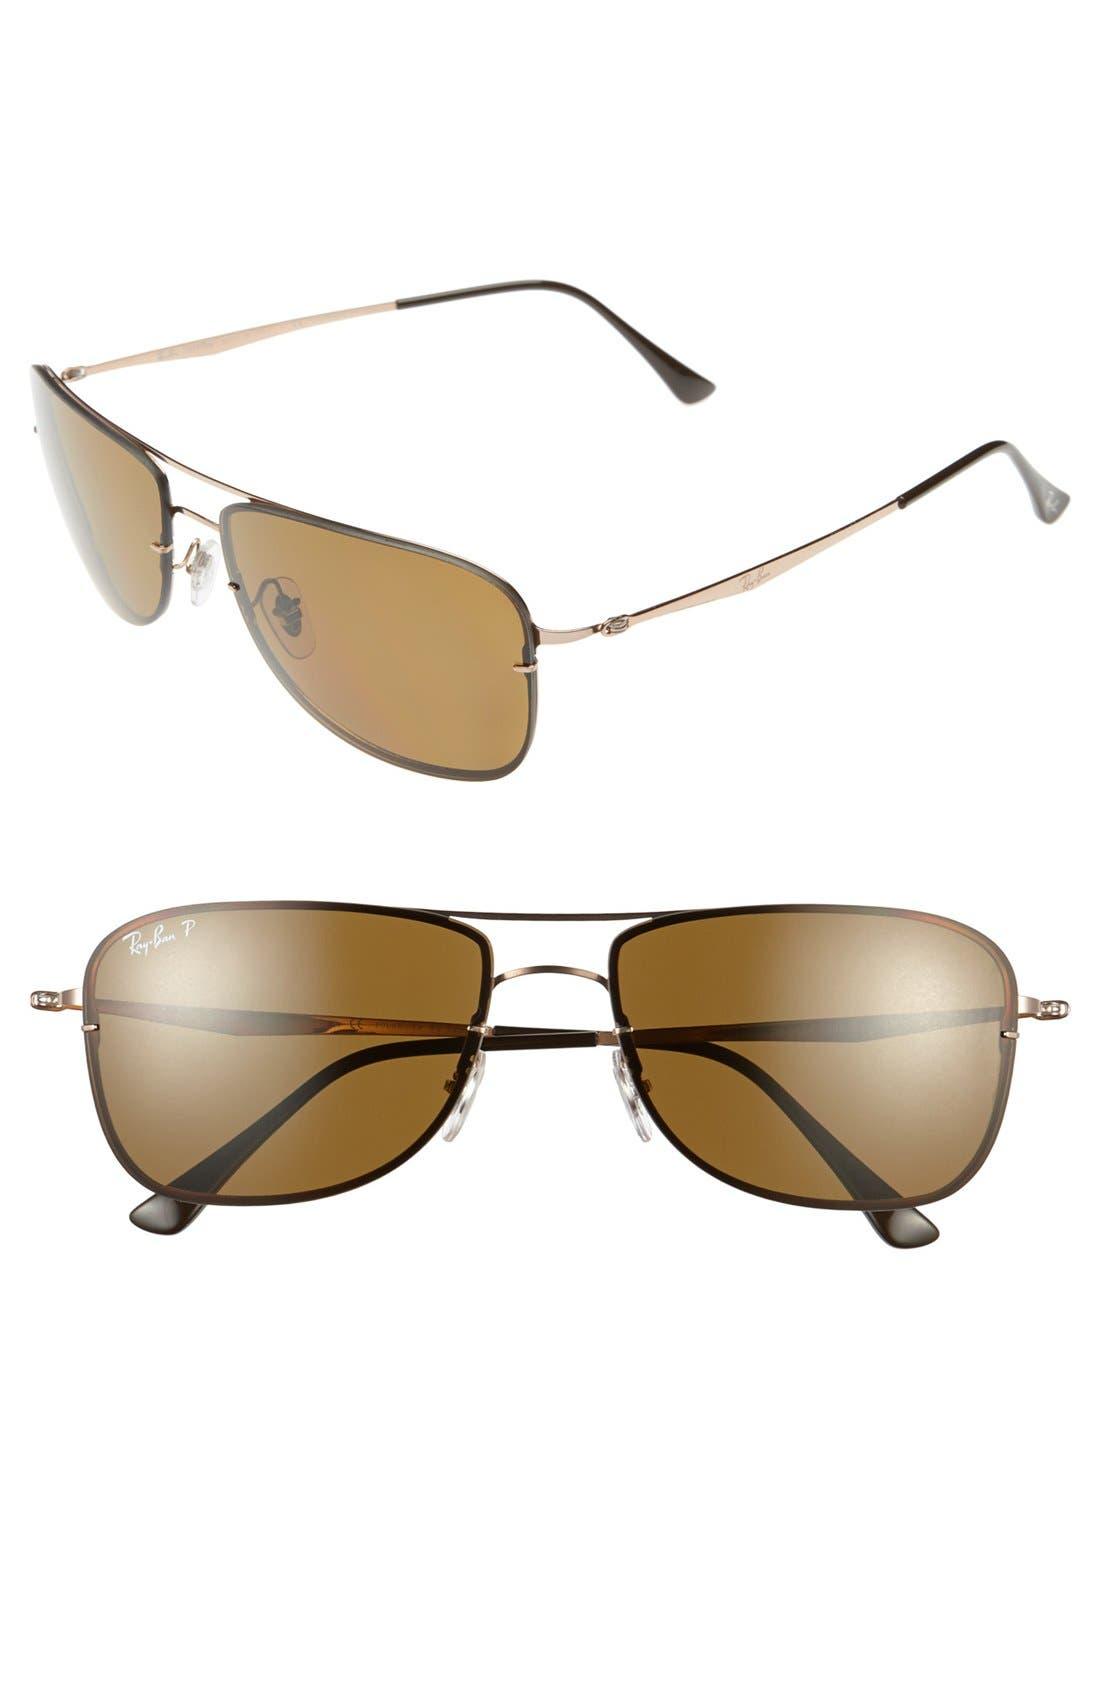 Alternate Image 1 Selected - Ray-Ban 'Pilot Aviator' Polarized Sunglasses